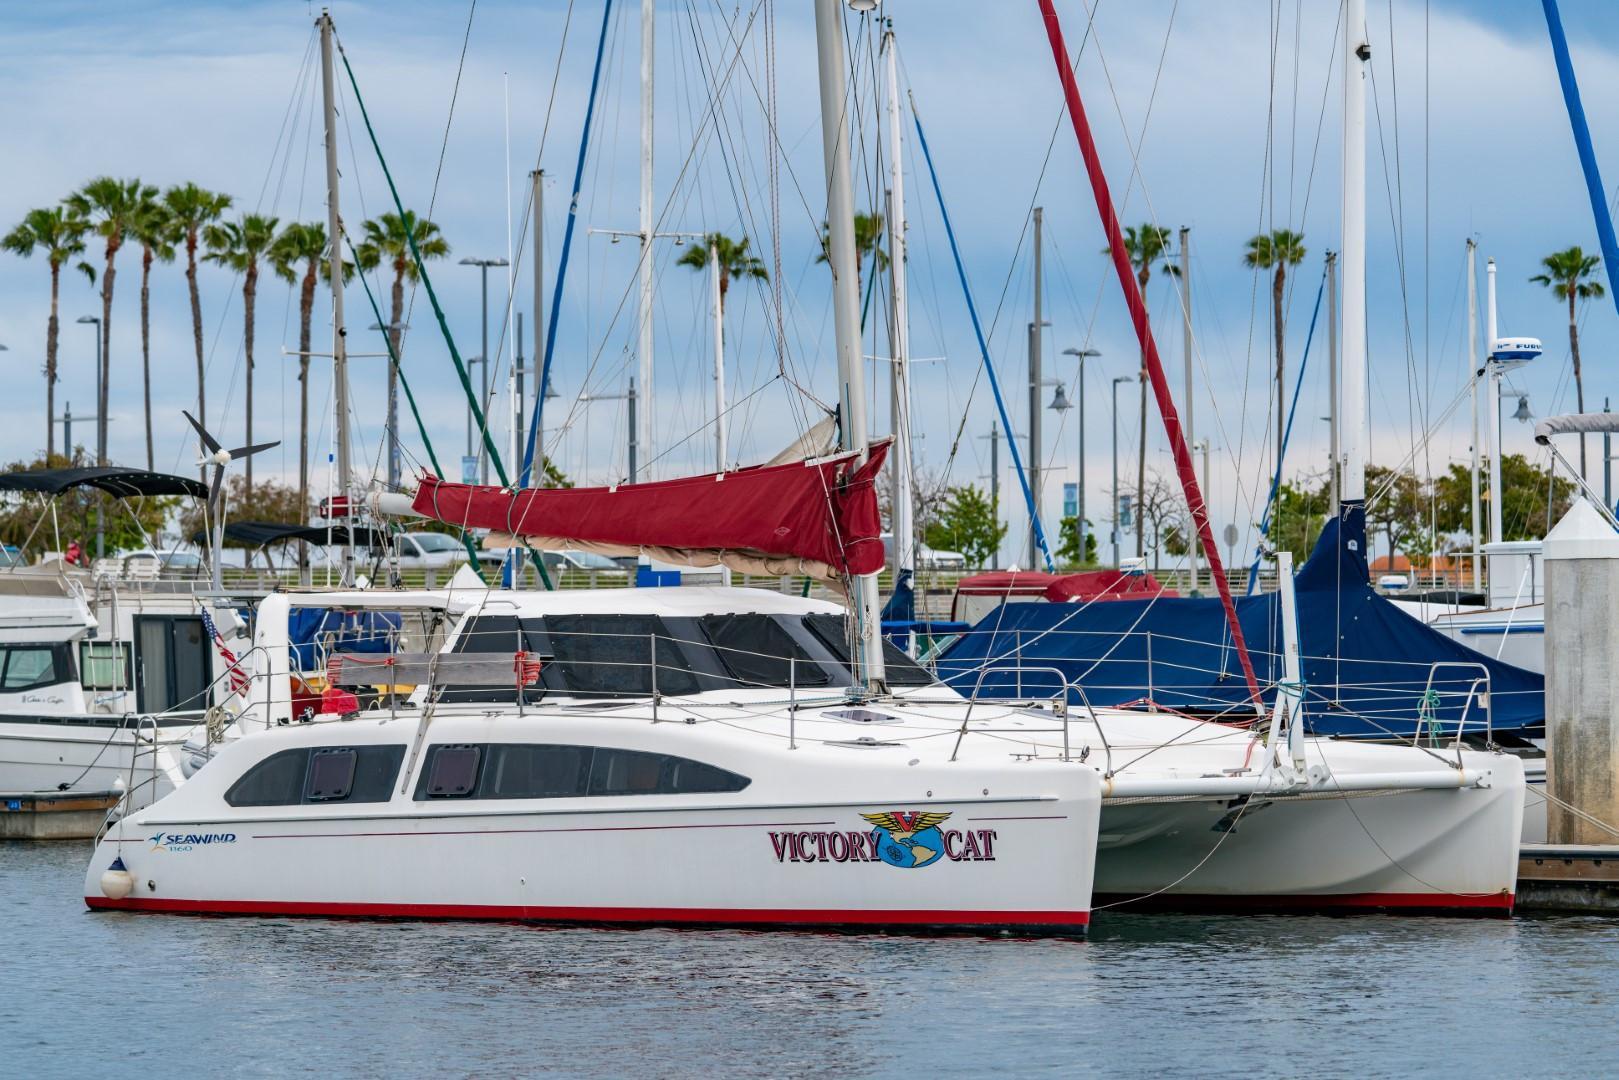 Seawind Archives | MultiYB - Multihull Yacht Brokerage